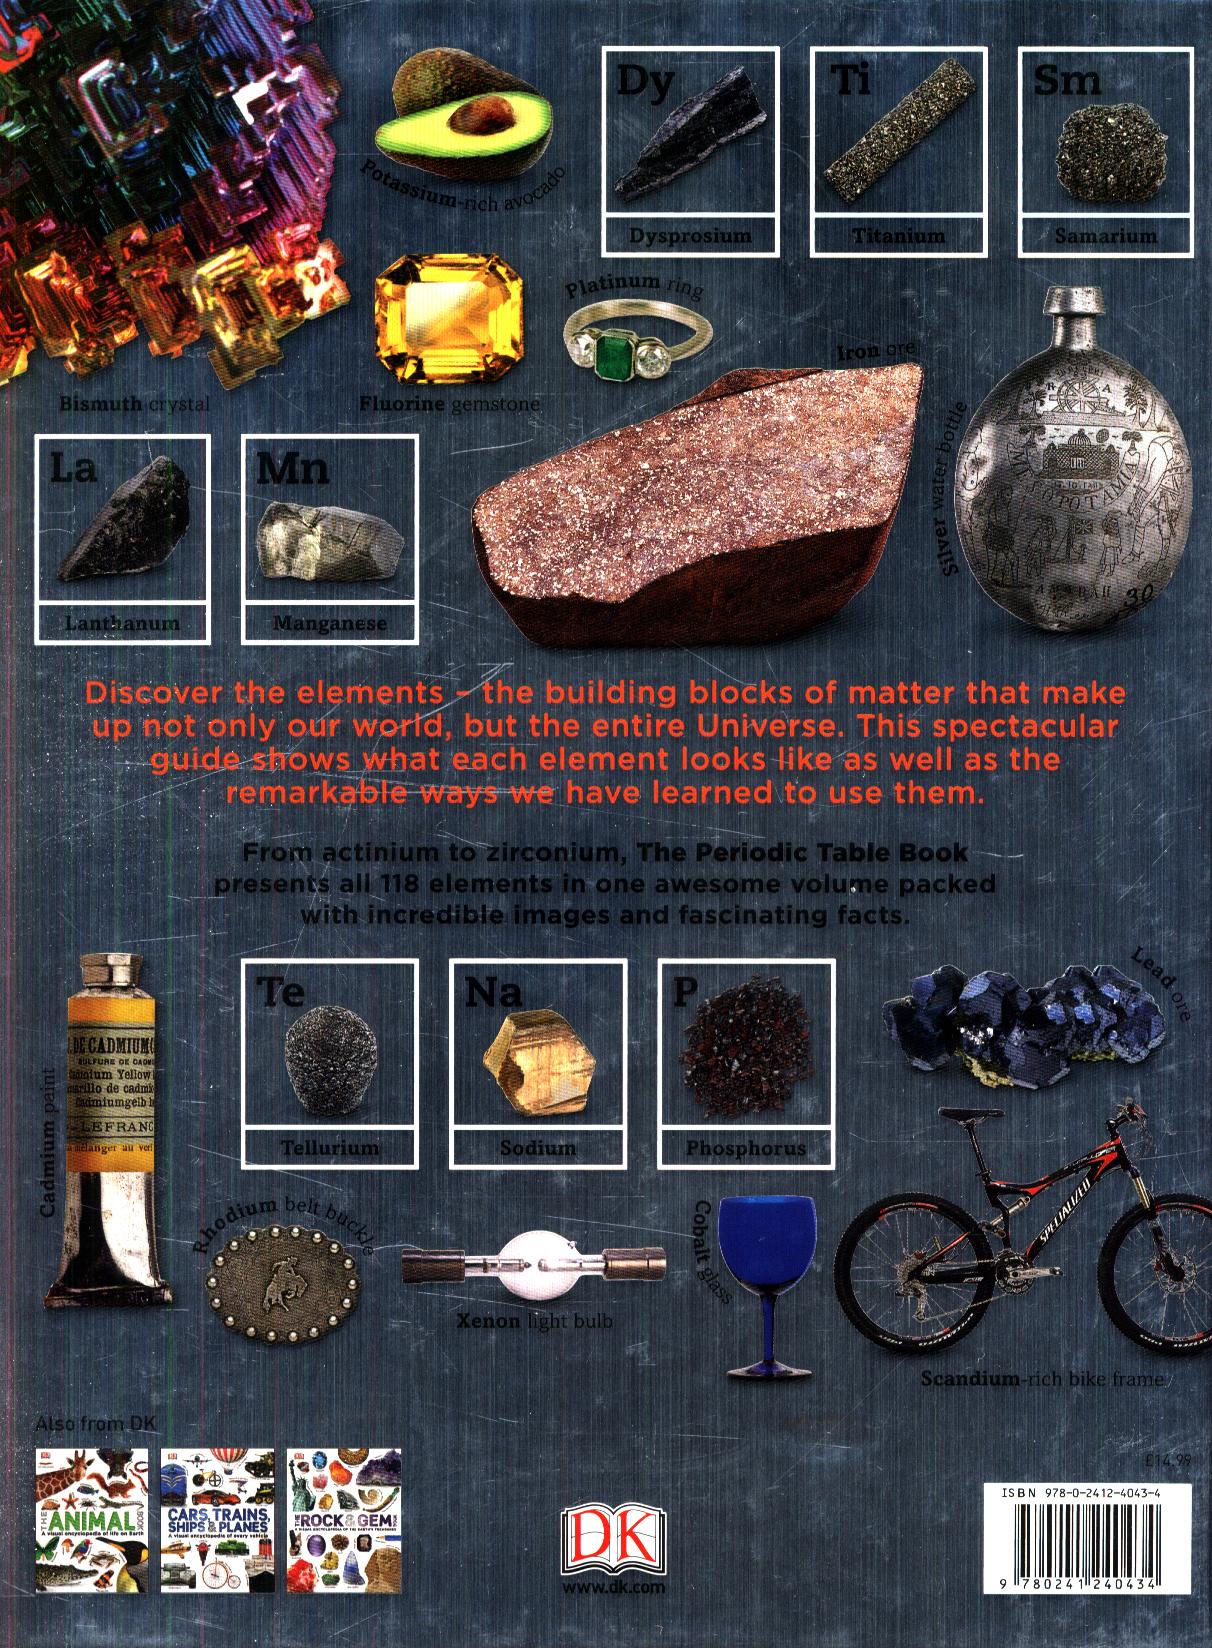 The periodic table book a visual encyclopedia of the elements by the periodic table book a visual encyclopedia of the elements by dk 9780241240434 brownsbfs gamestrikefo Choice Image